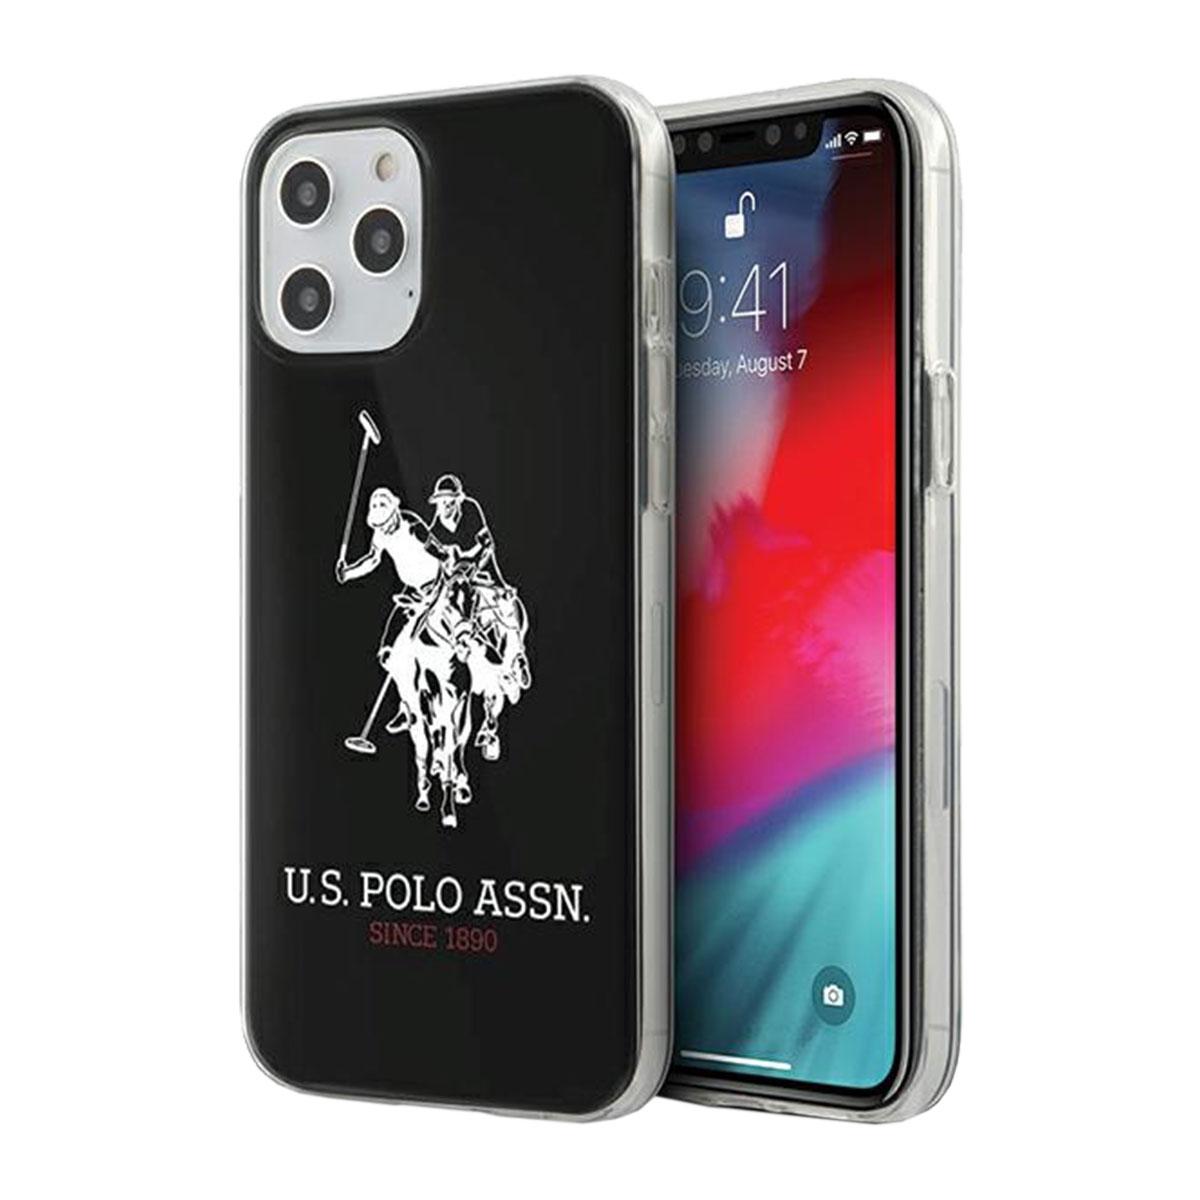 US Polo iPhone 12 / 12 Pro 6.1 Silikon Hülle Shiny Schwarz Case Cover Hülle  - Kaufen bei Wigento GmbH